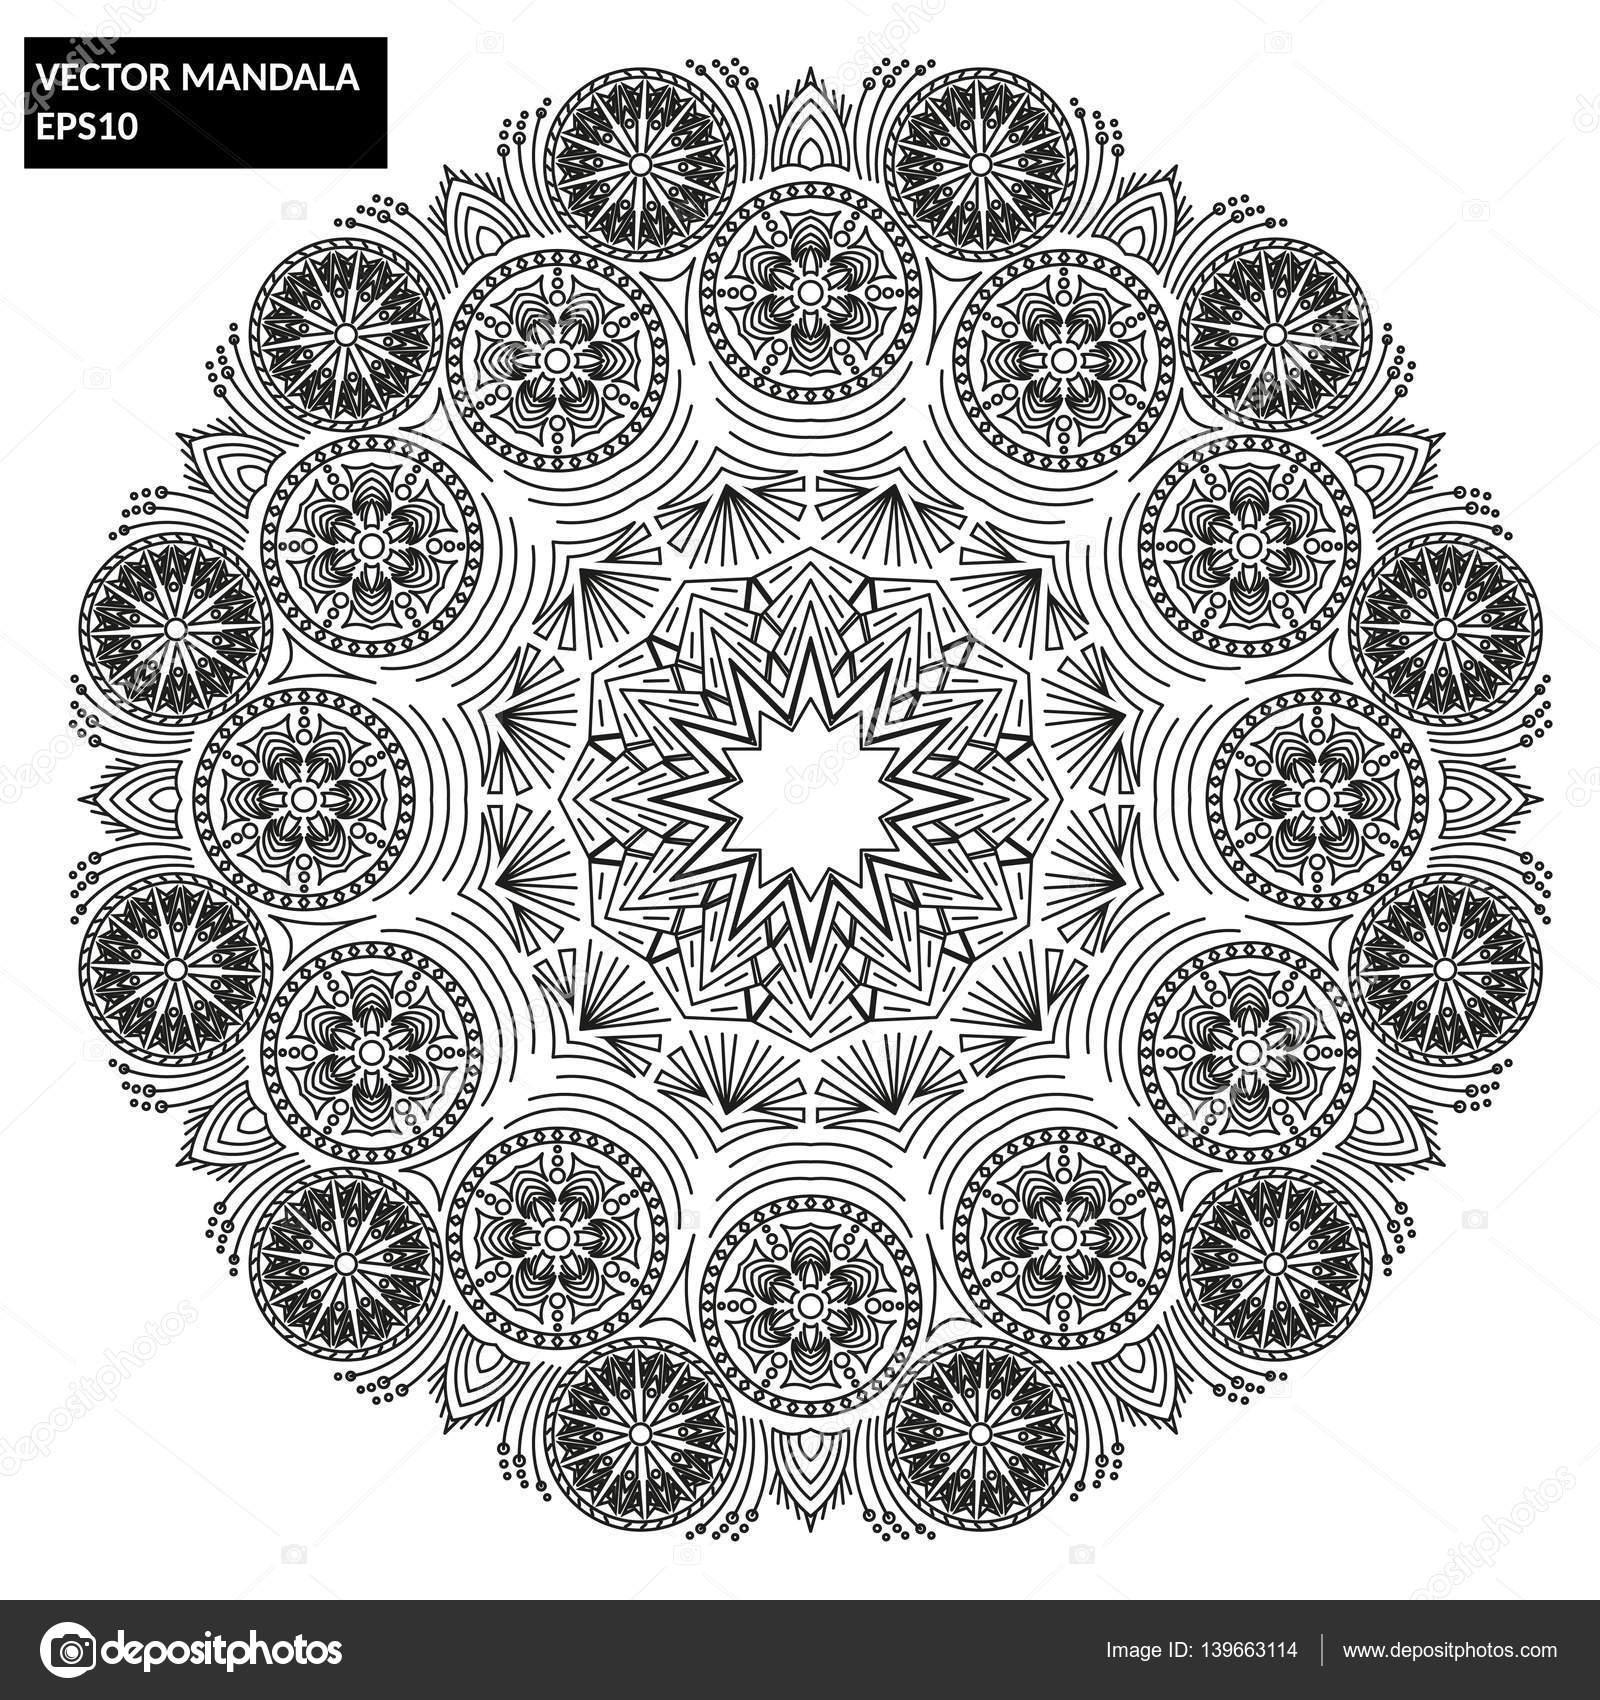 depositphotos stock illustration mandala vector mandala floral mandala